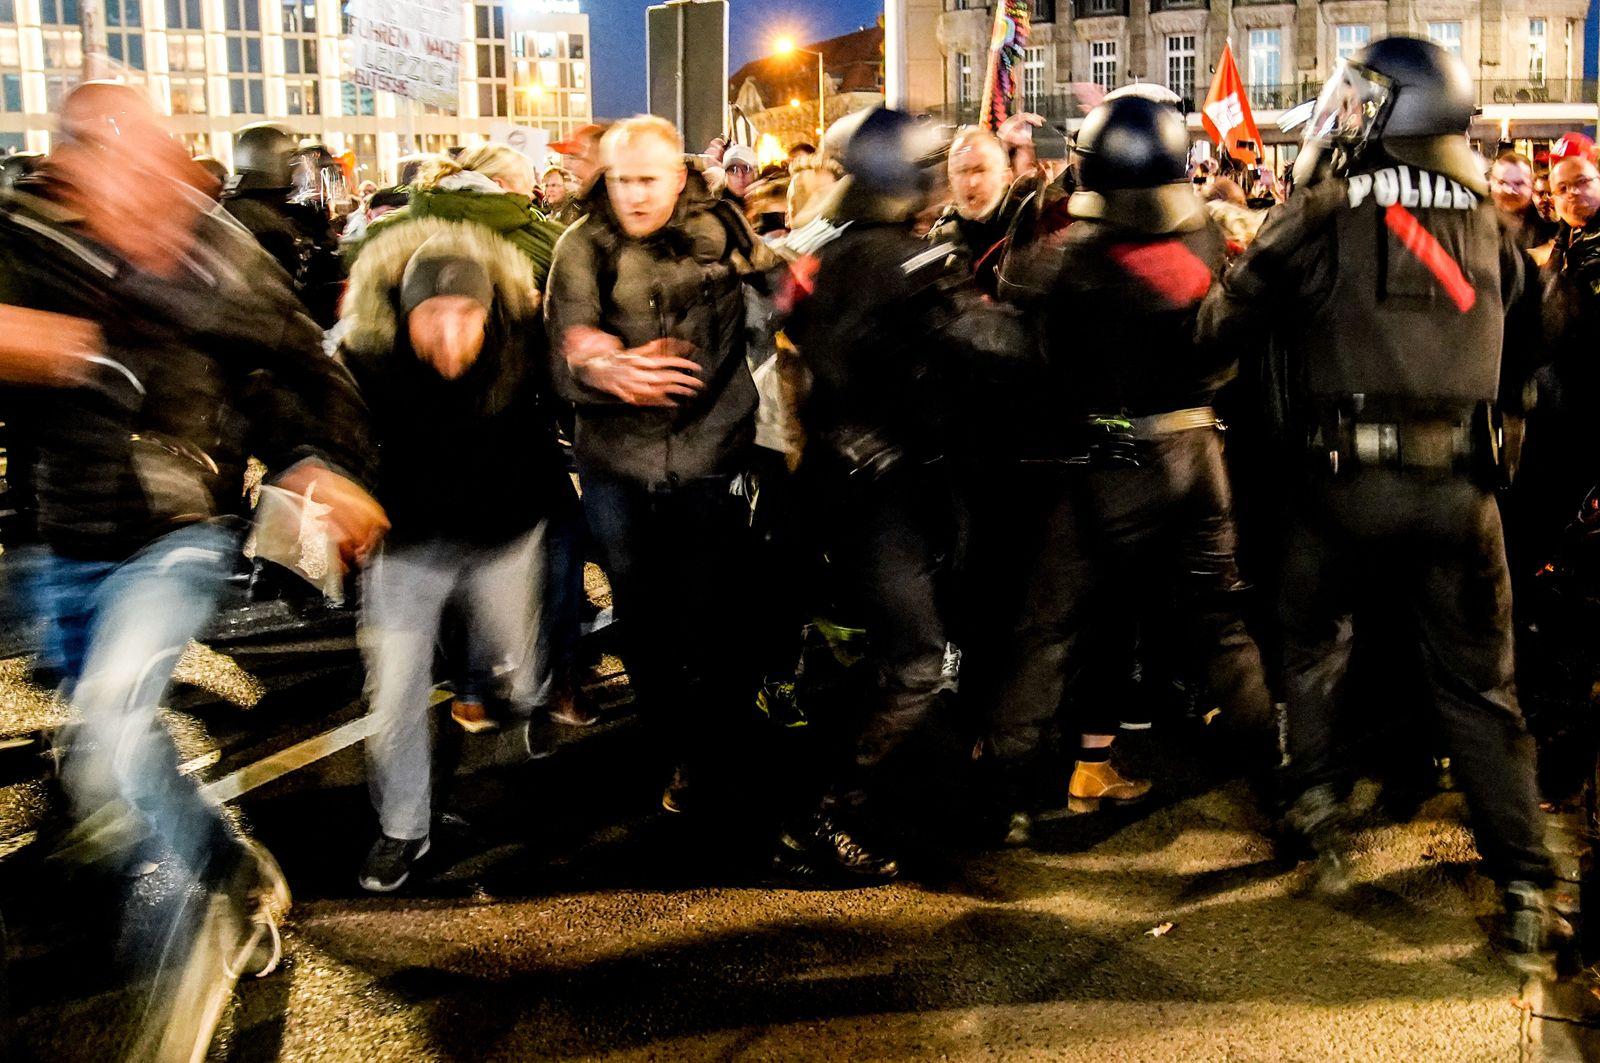 Demonstration against coronavirus restrictions in Leipzig, Germany - 07 Nov 2020